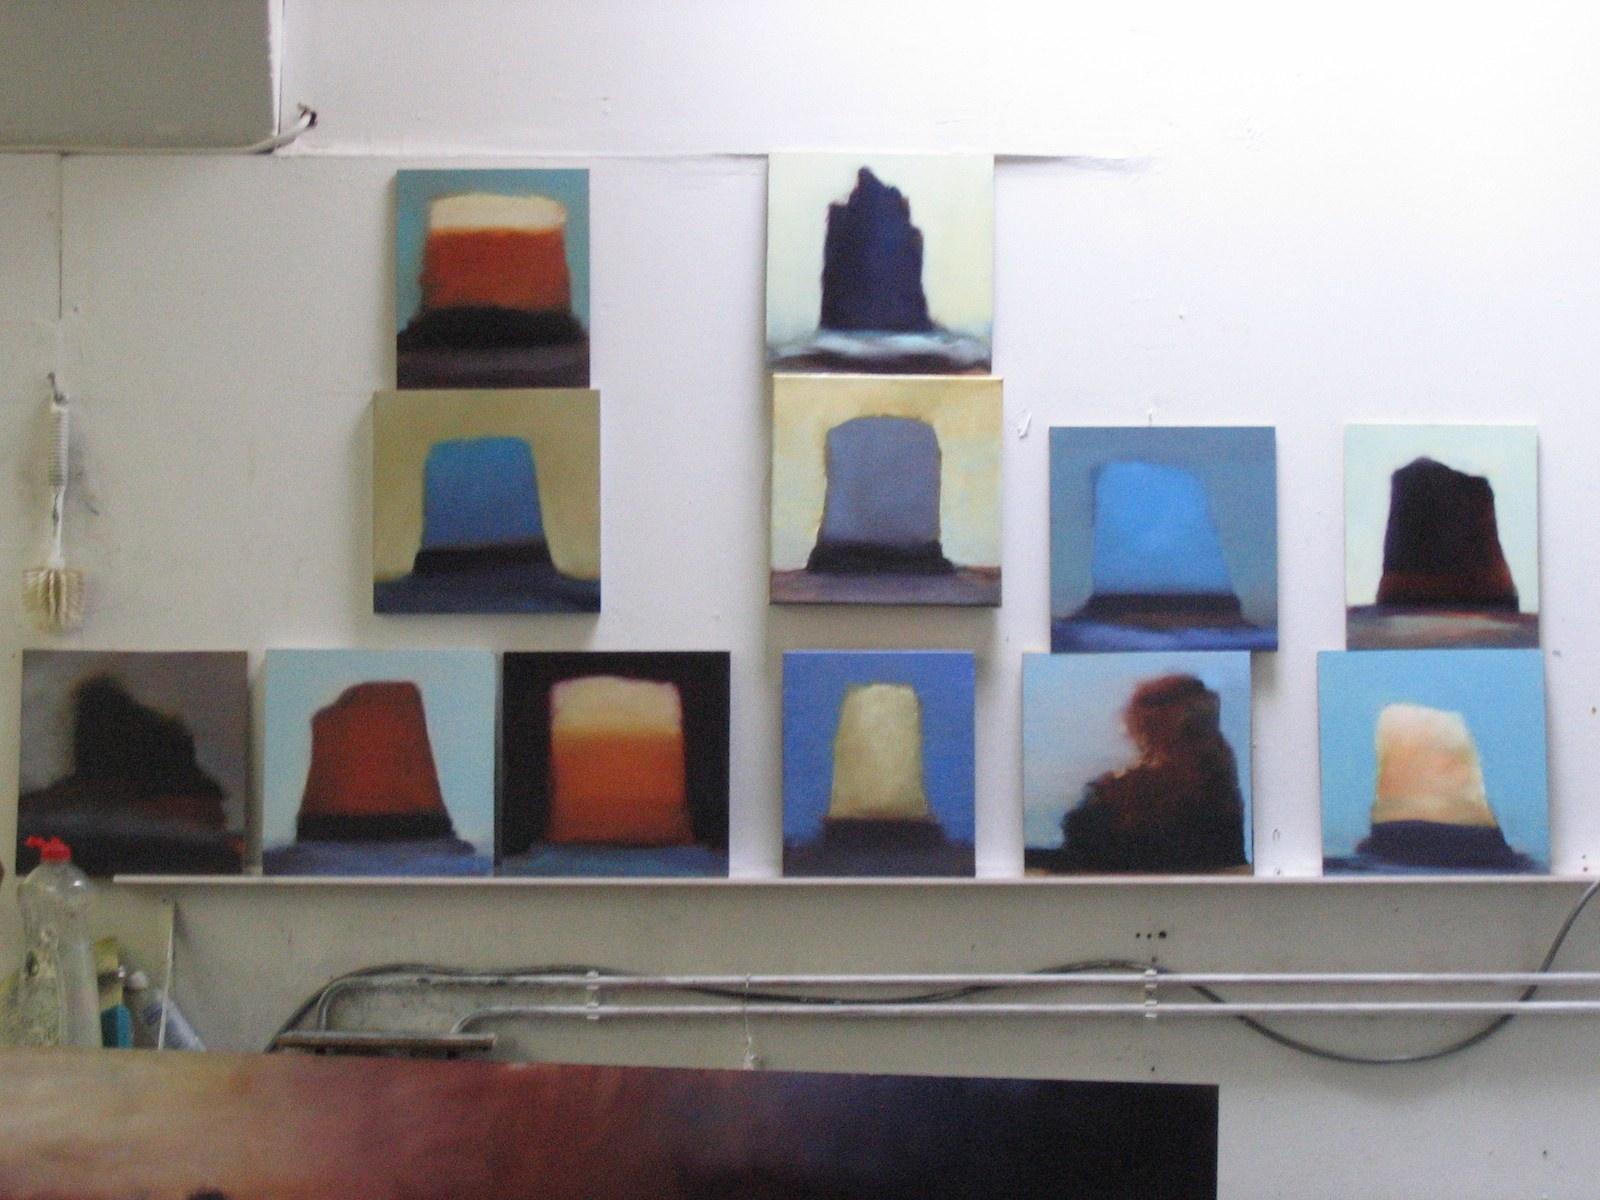 Studio view, Helsinki, 2009